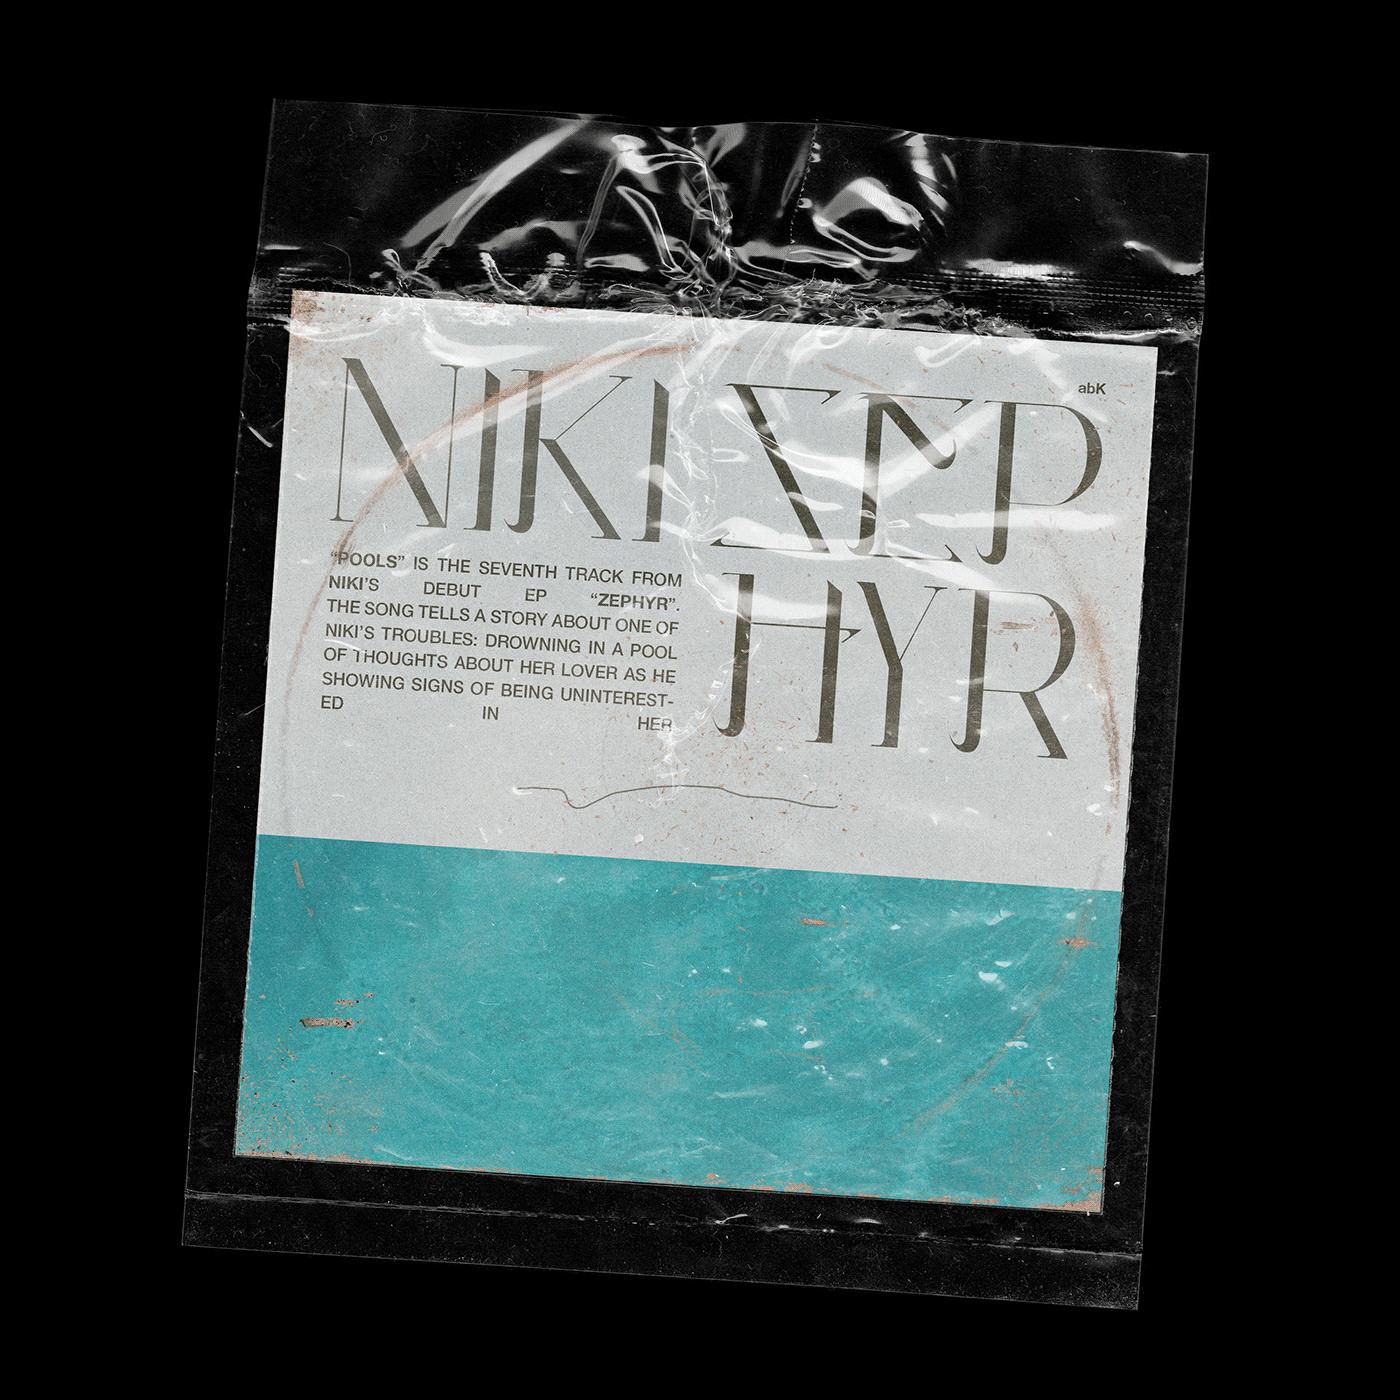 album cover art art direction  cd concept graphic design  Mockup music typography   vinyl